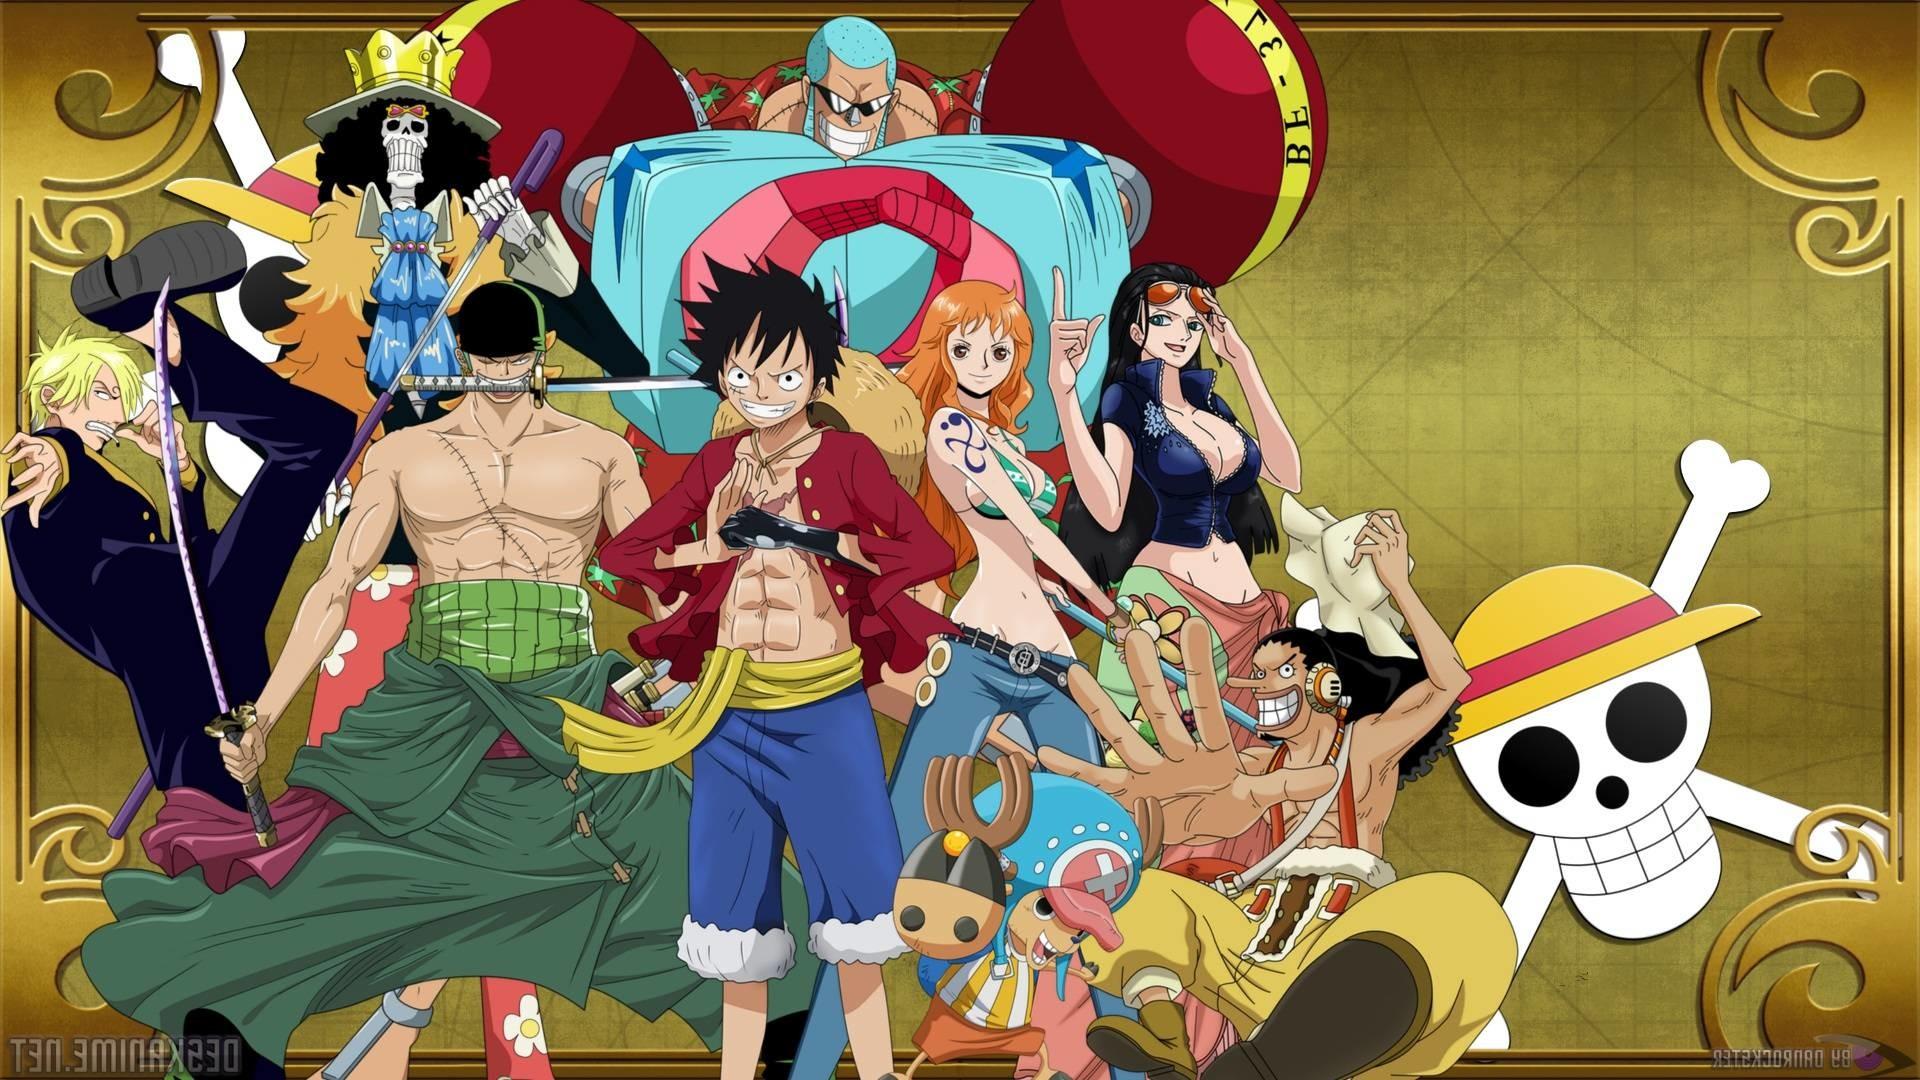 Wallpaper One Piece Hd For Desktop Anime Wallpaper Hd